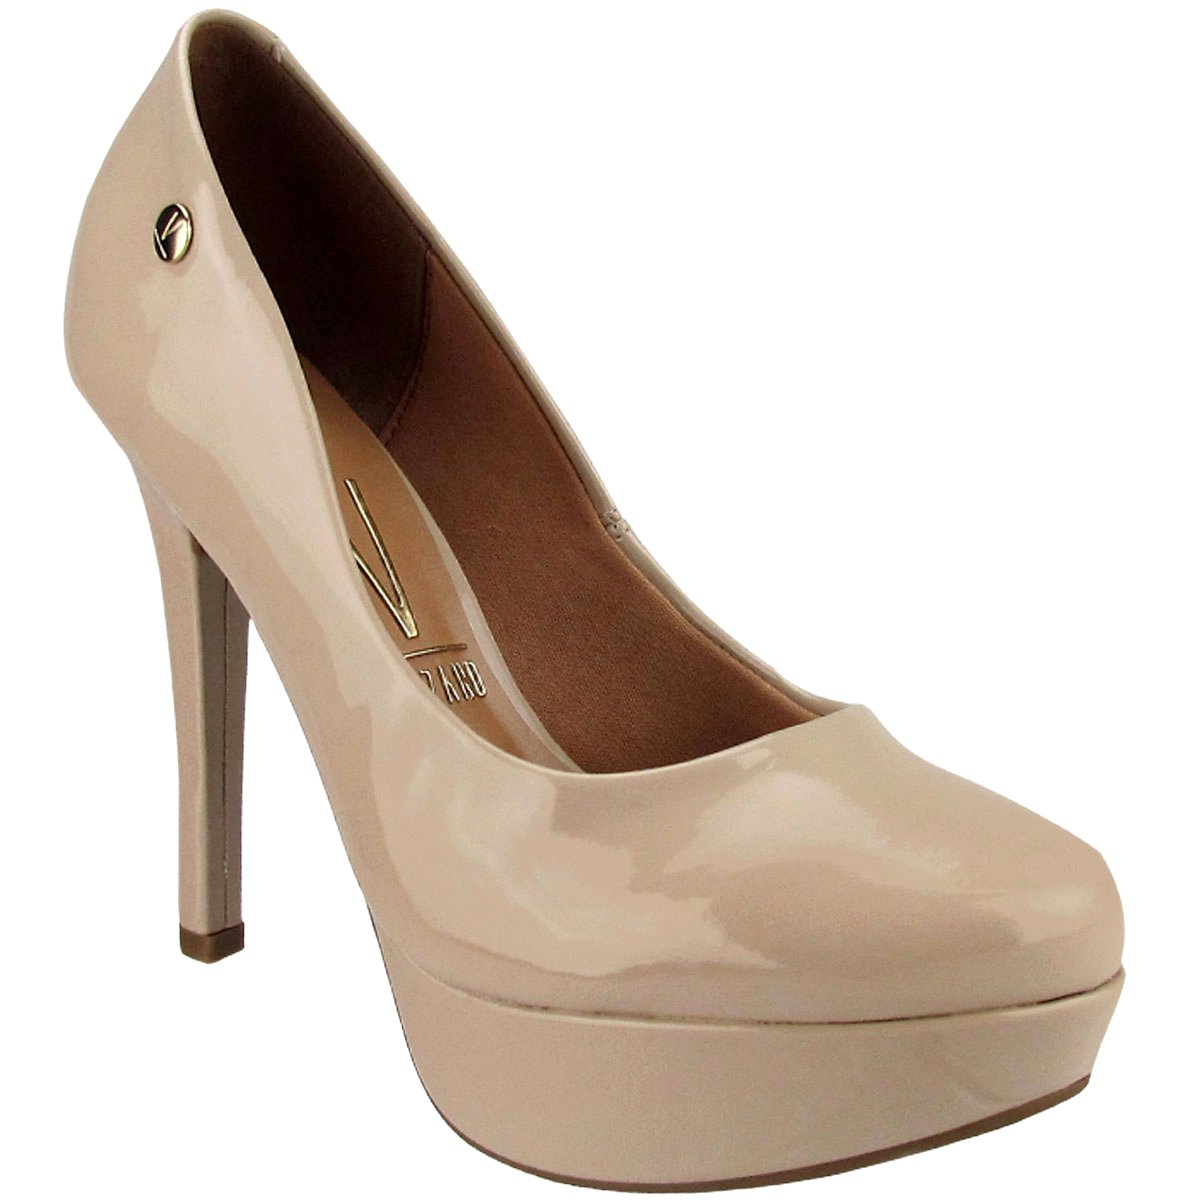 2a43a5550 Sapato Vizzano Verniz Cristal Brilho Bege Feminino - Compre Agora ...